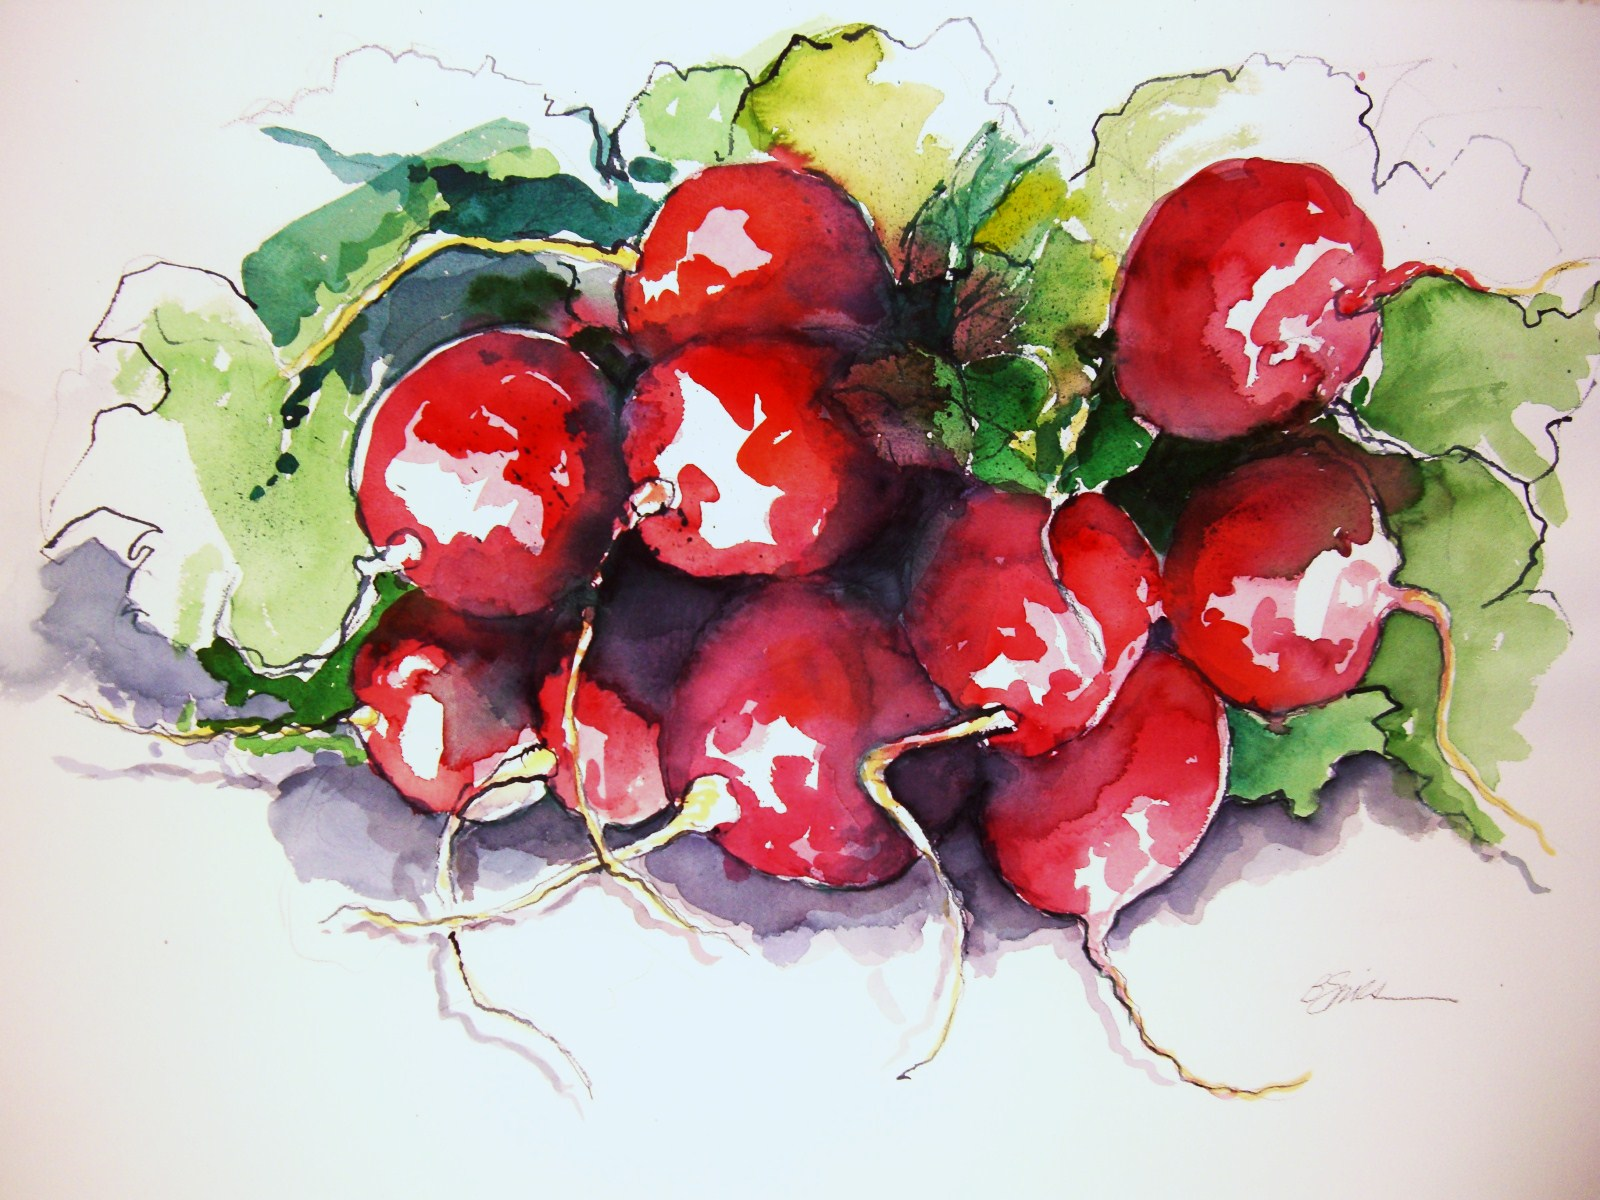 Farmer's Market Series, watercolor